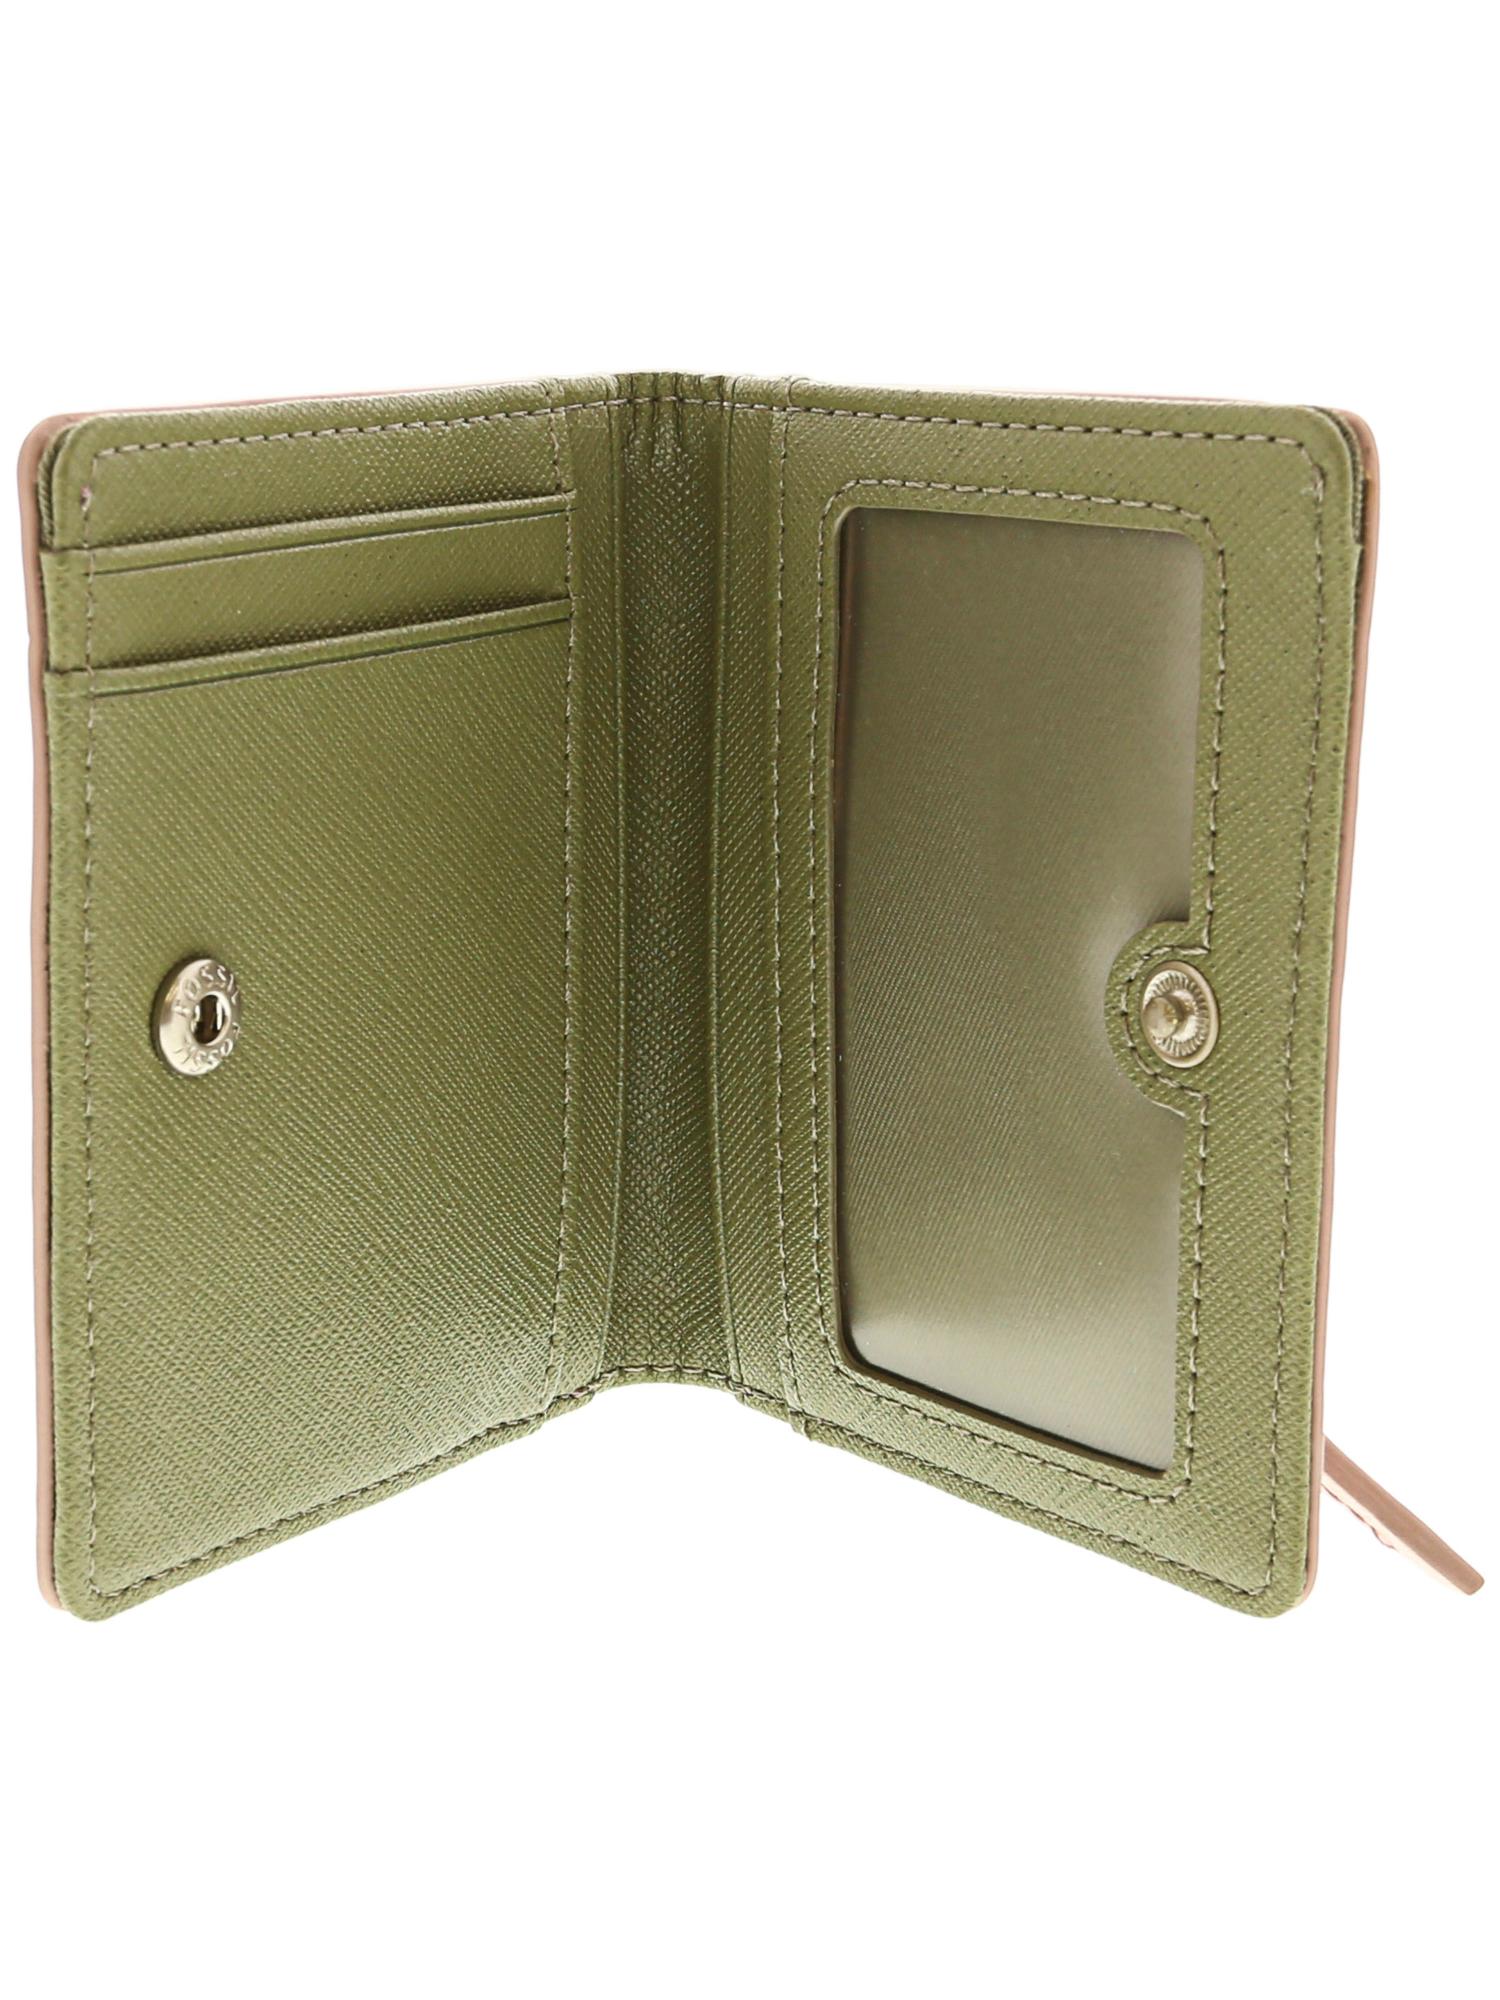 Fossil-Women-039-s-Emma-Rfid-Mini-Leather-Wallet thumbnail 10